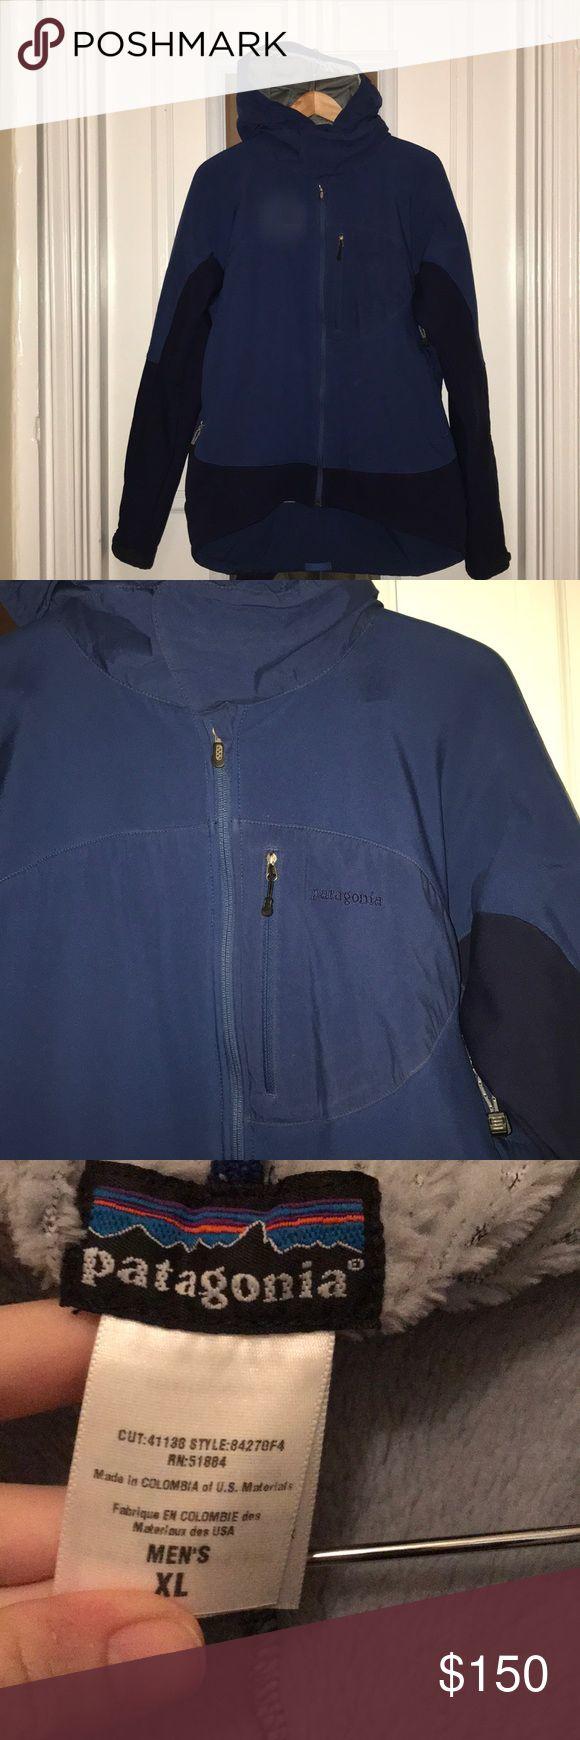 Blue Patagonia ski jacket Excellent condition. No flaws Patagonia Jackets & Coats Ski & Snowboard